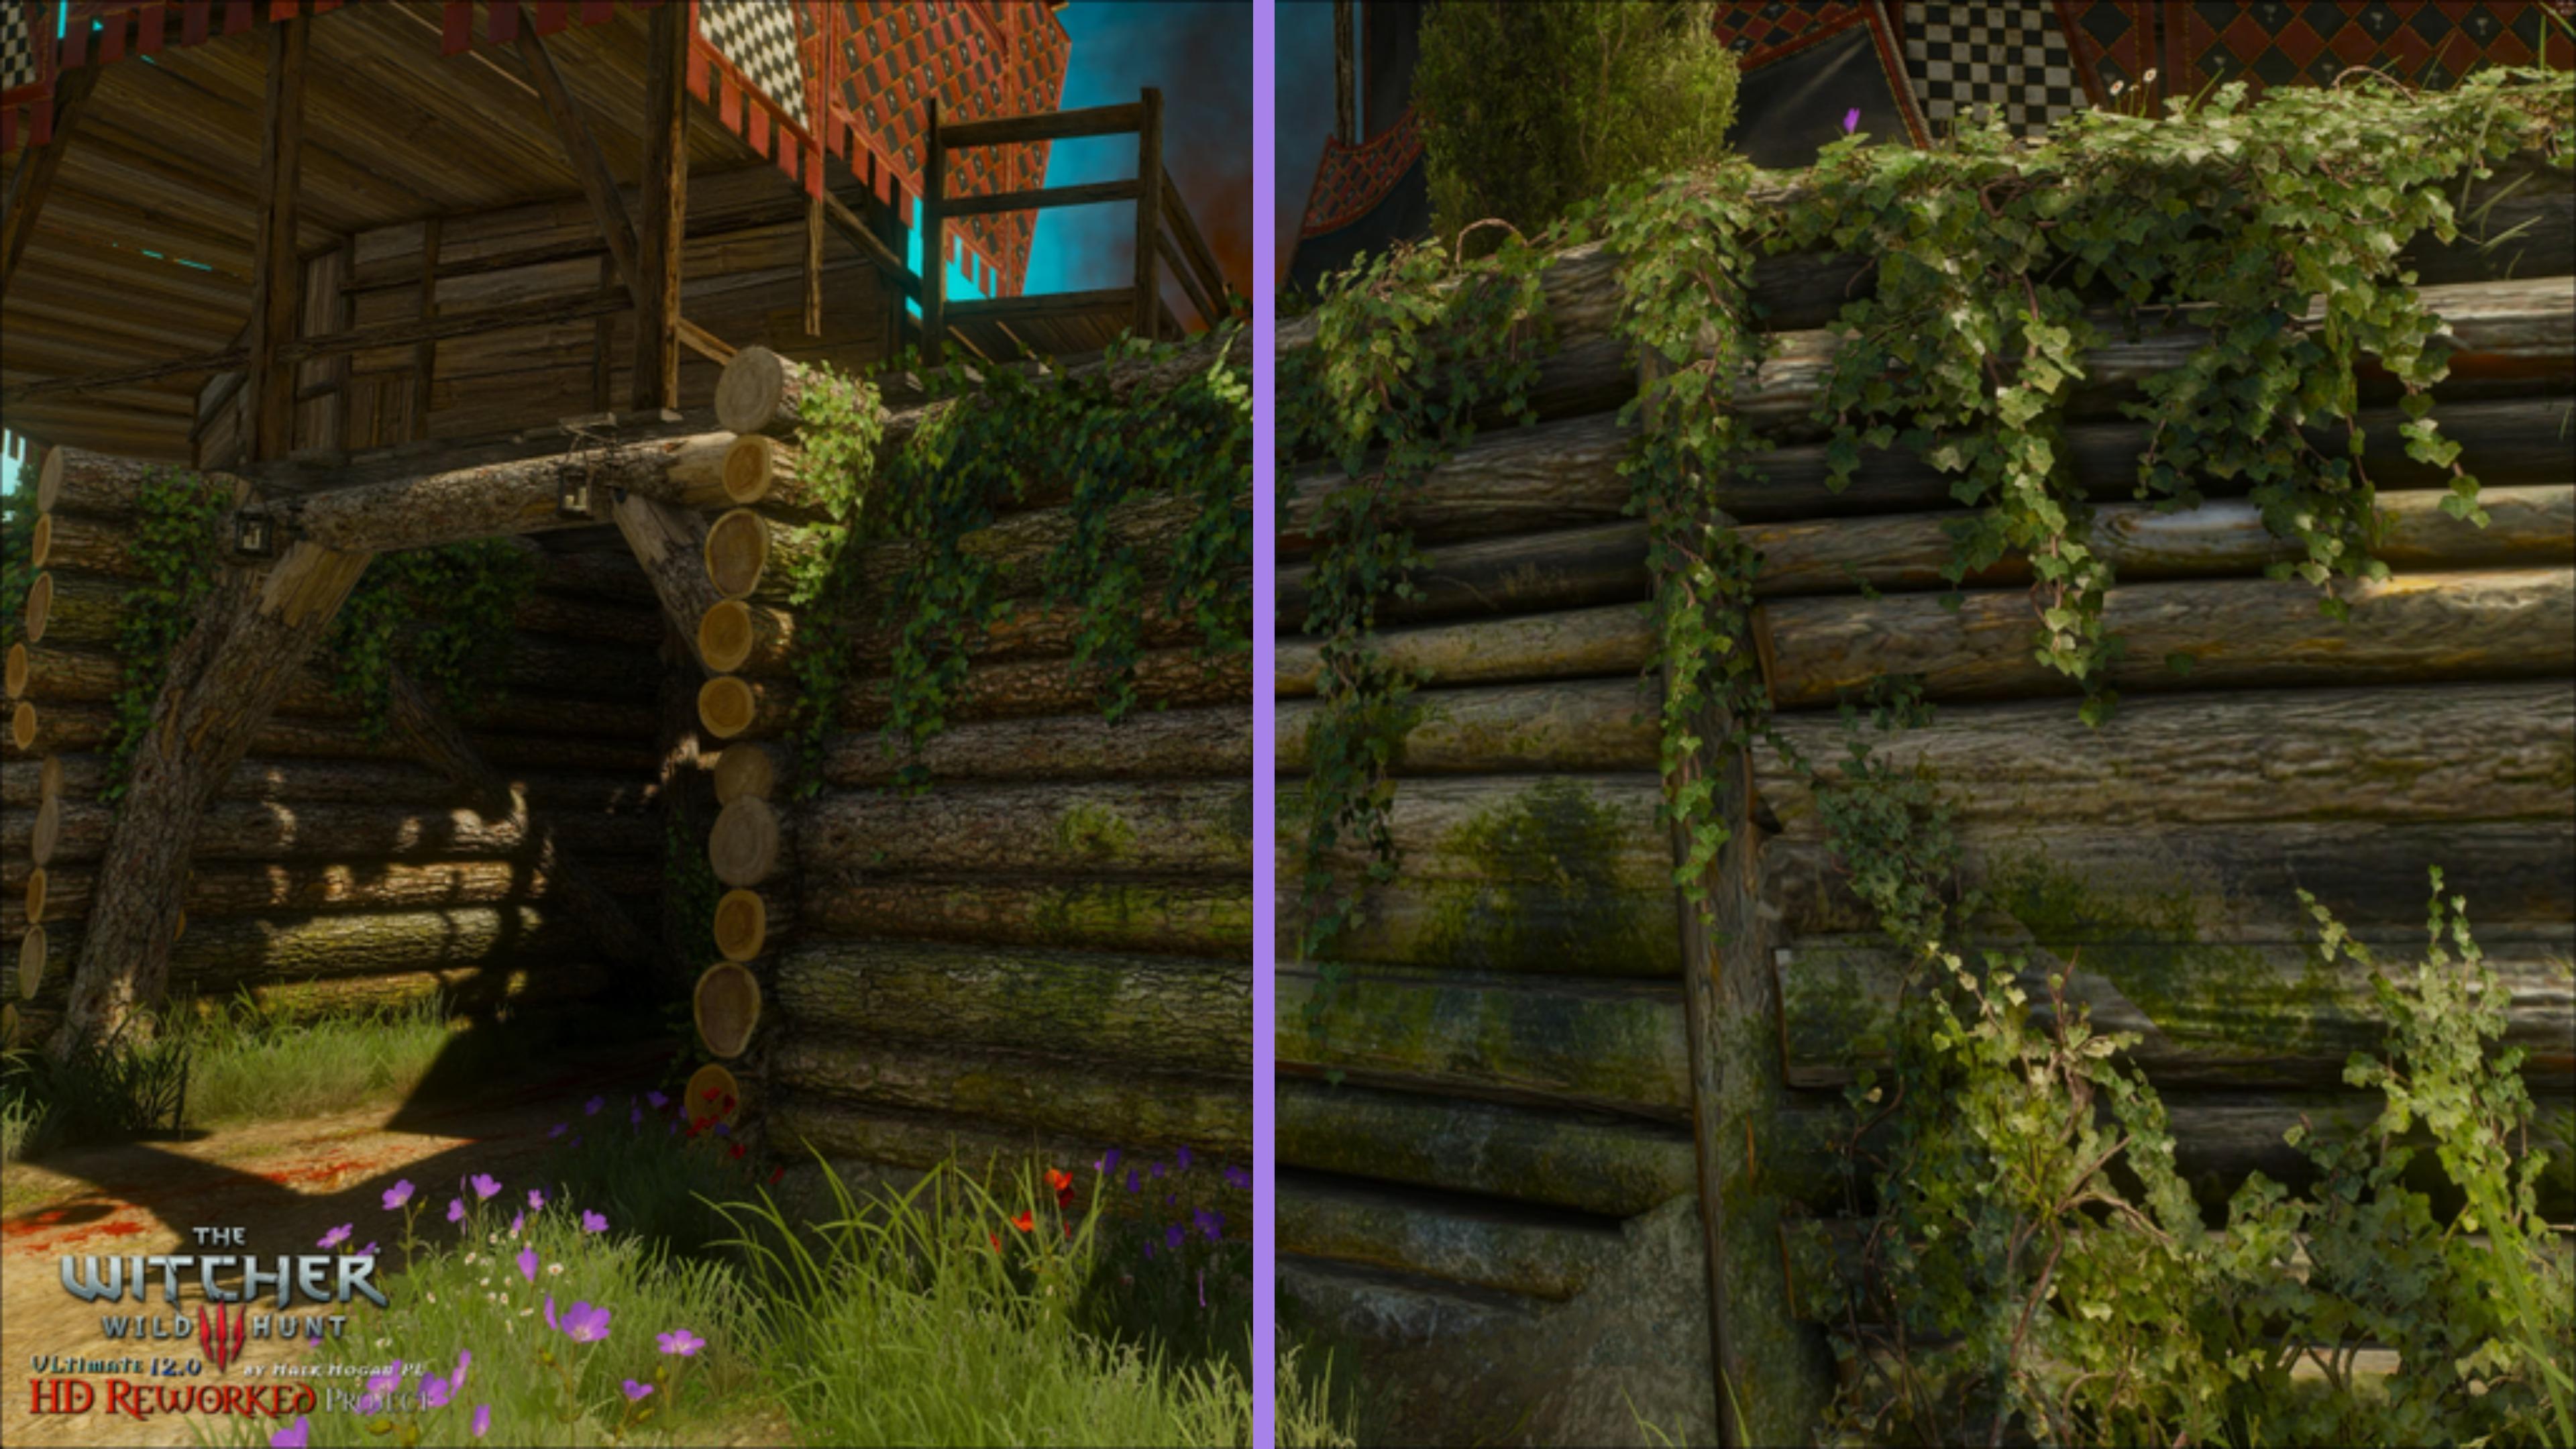 The Witcher 3 HD Reworked Project доступен для загрузки